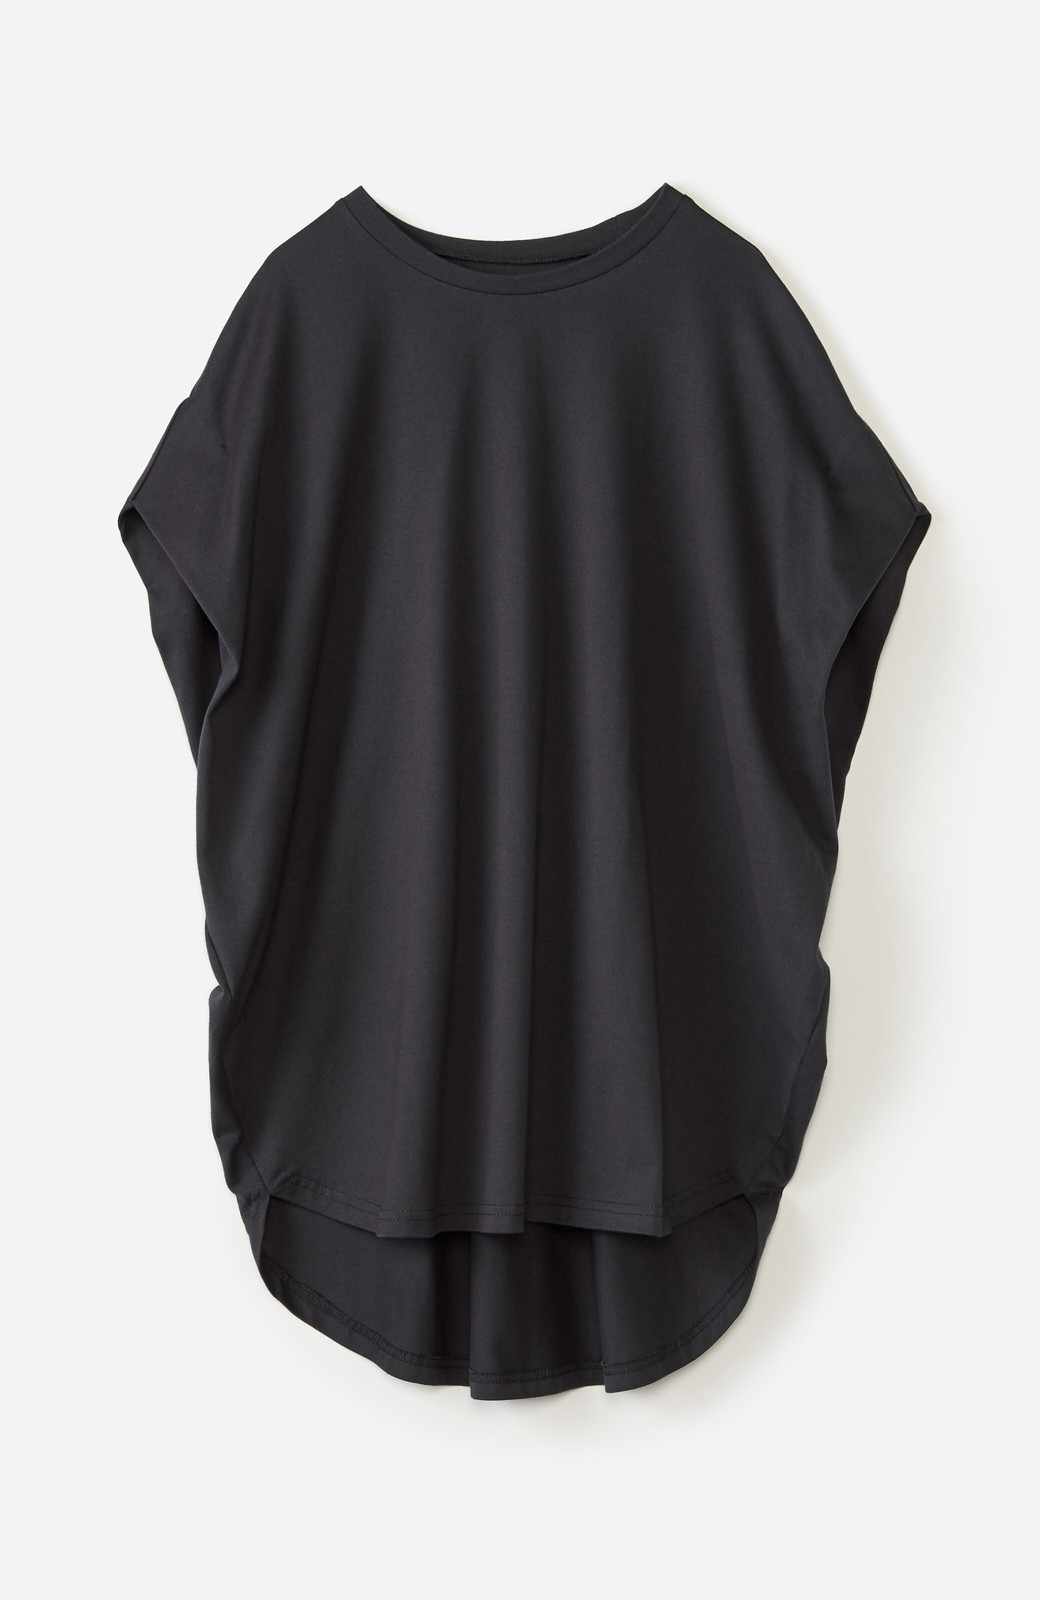 haco! PBPオーガニックコットン 楽ちんなのにブラウス気分で着られる大人のおめかしTシャツ <チャコールグレー>の商品写真21